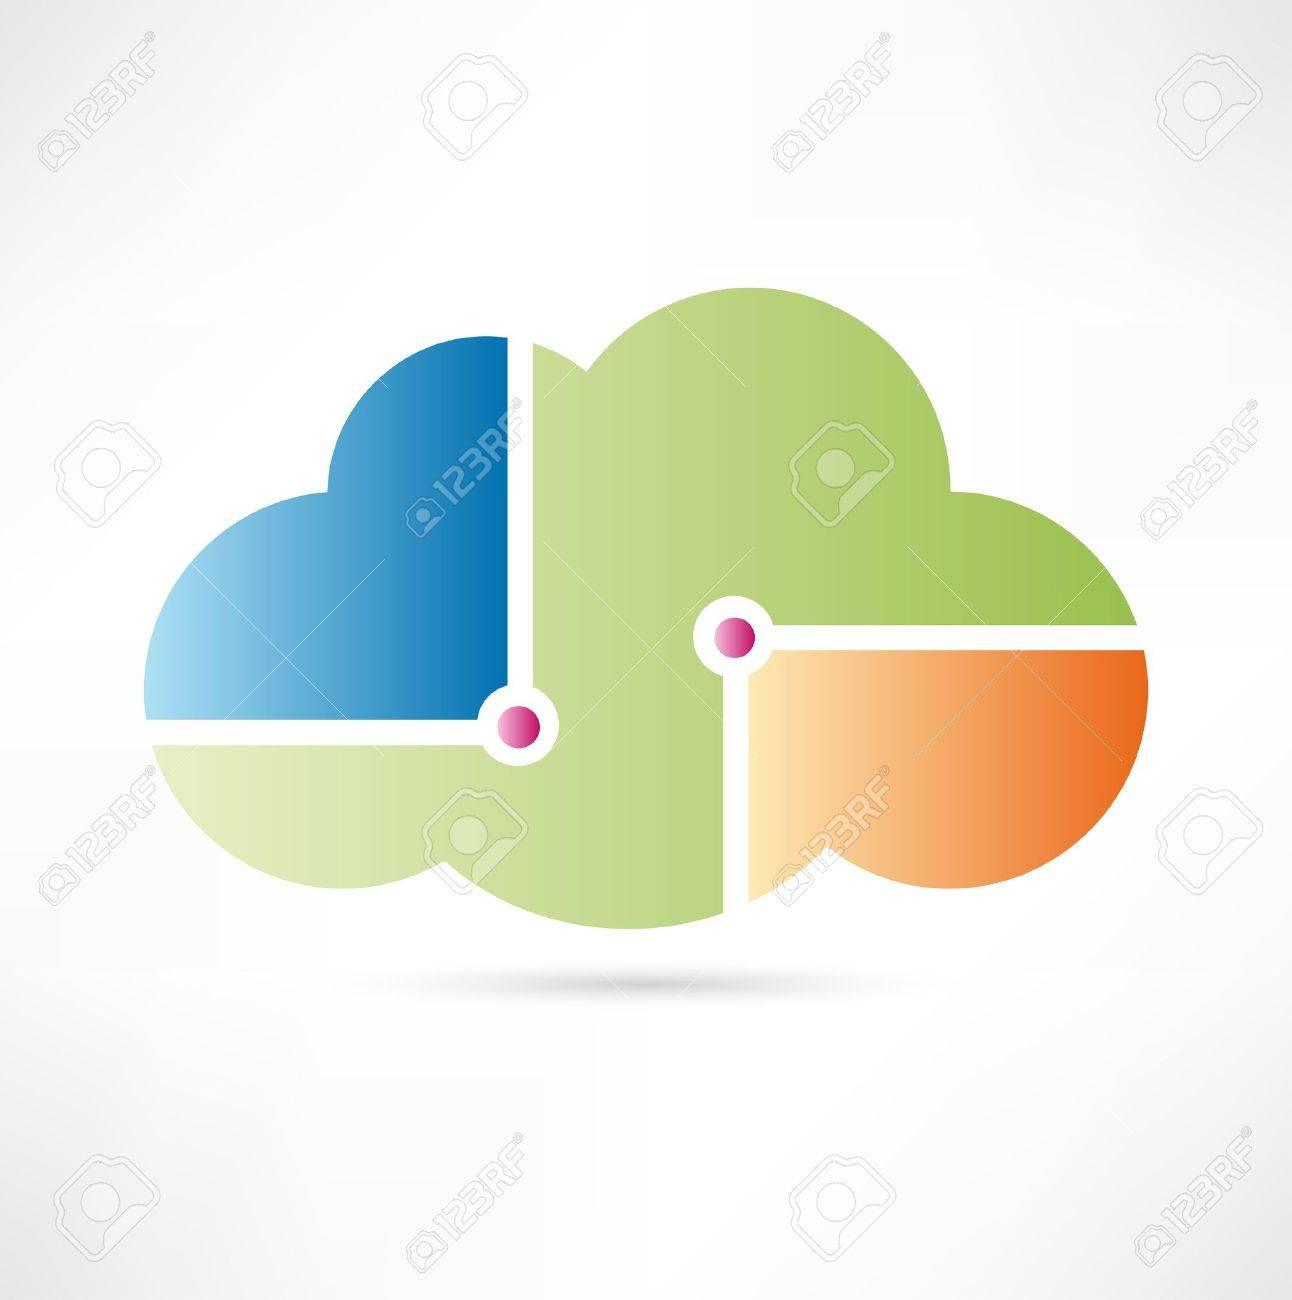 Cloud computing icon Stock Vector - 15567809